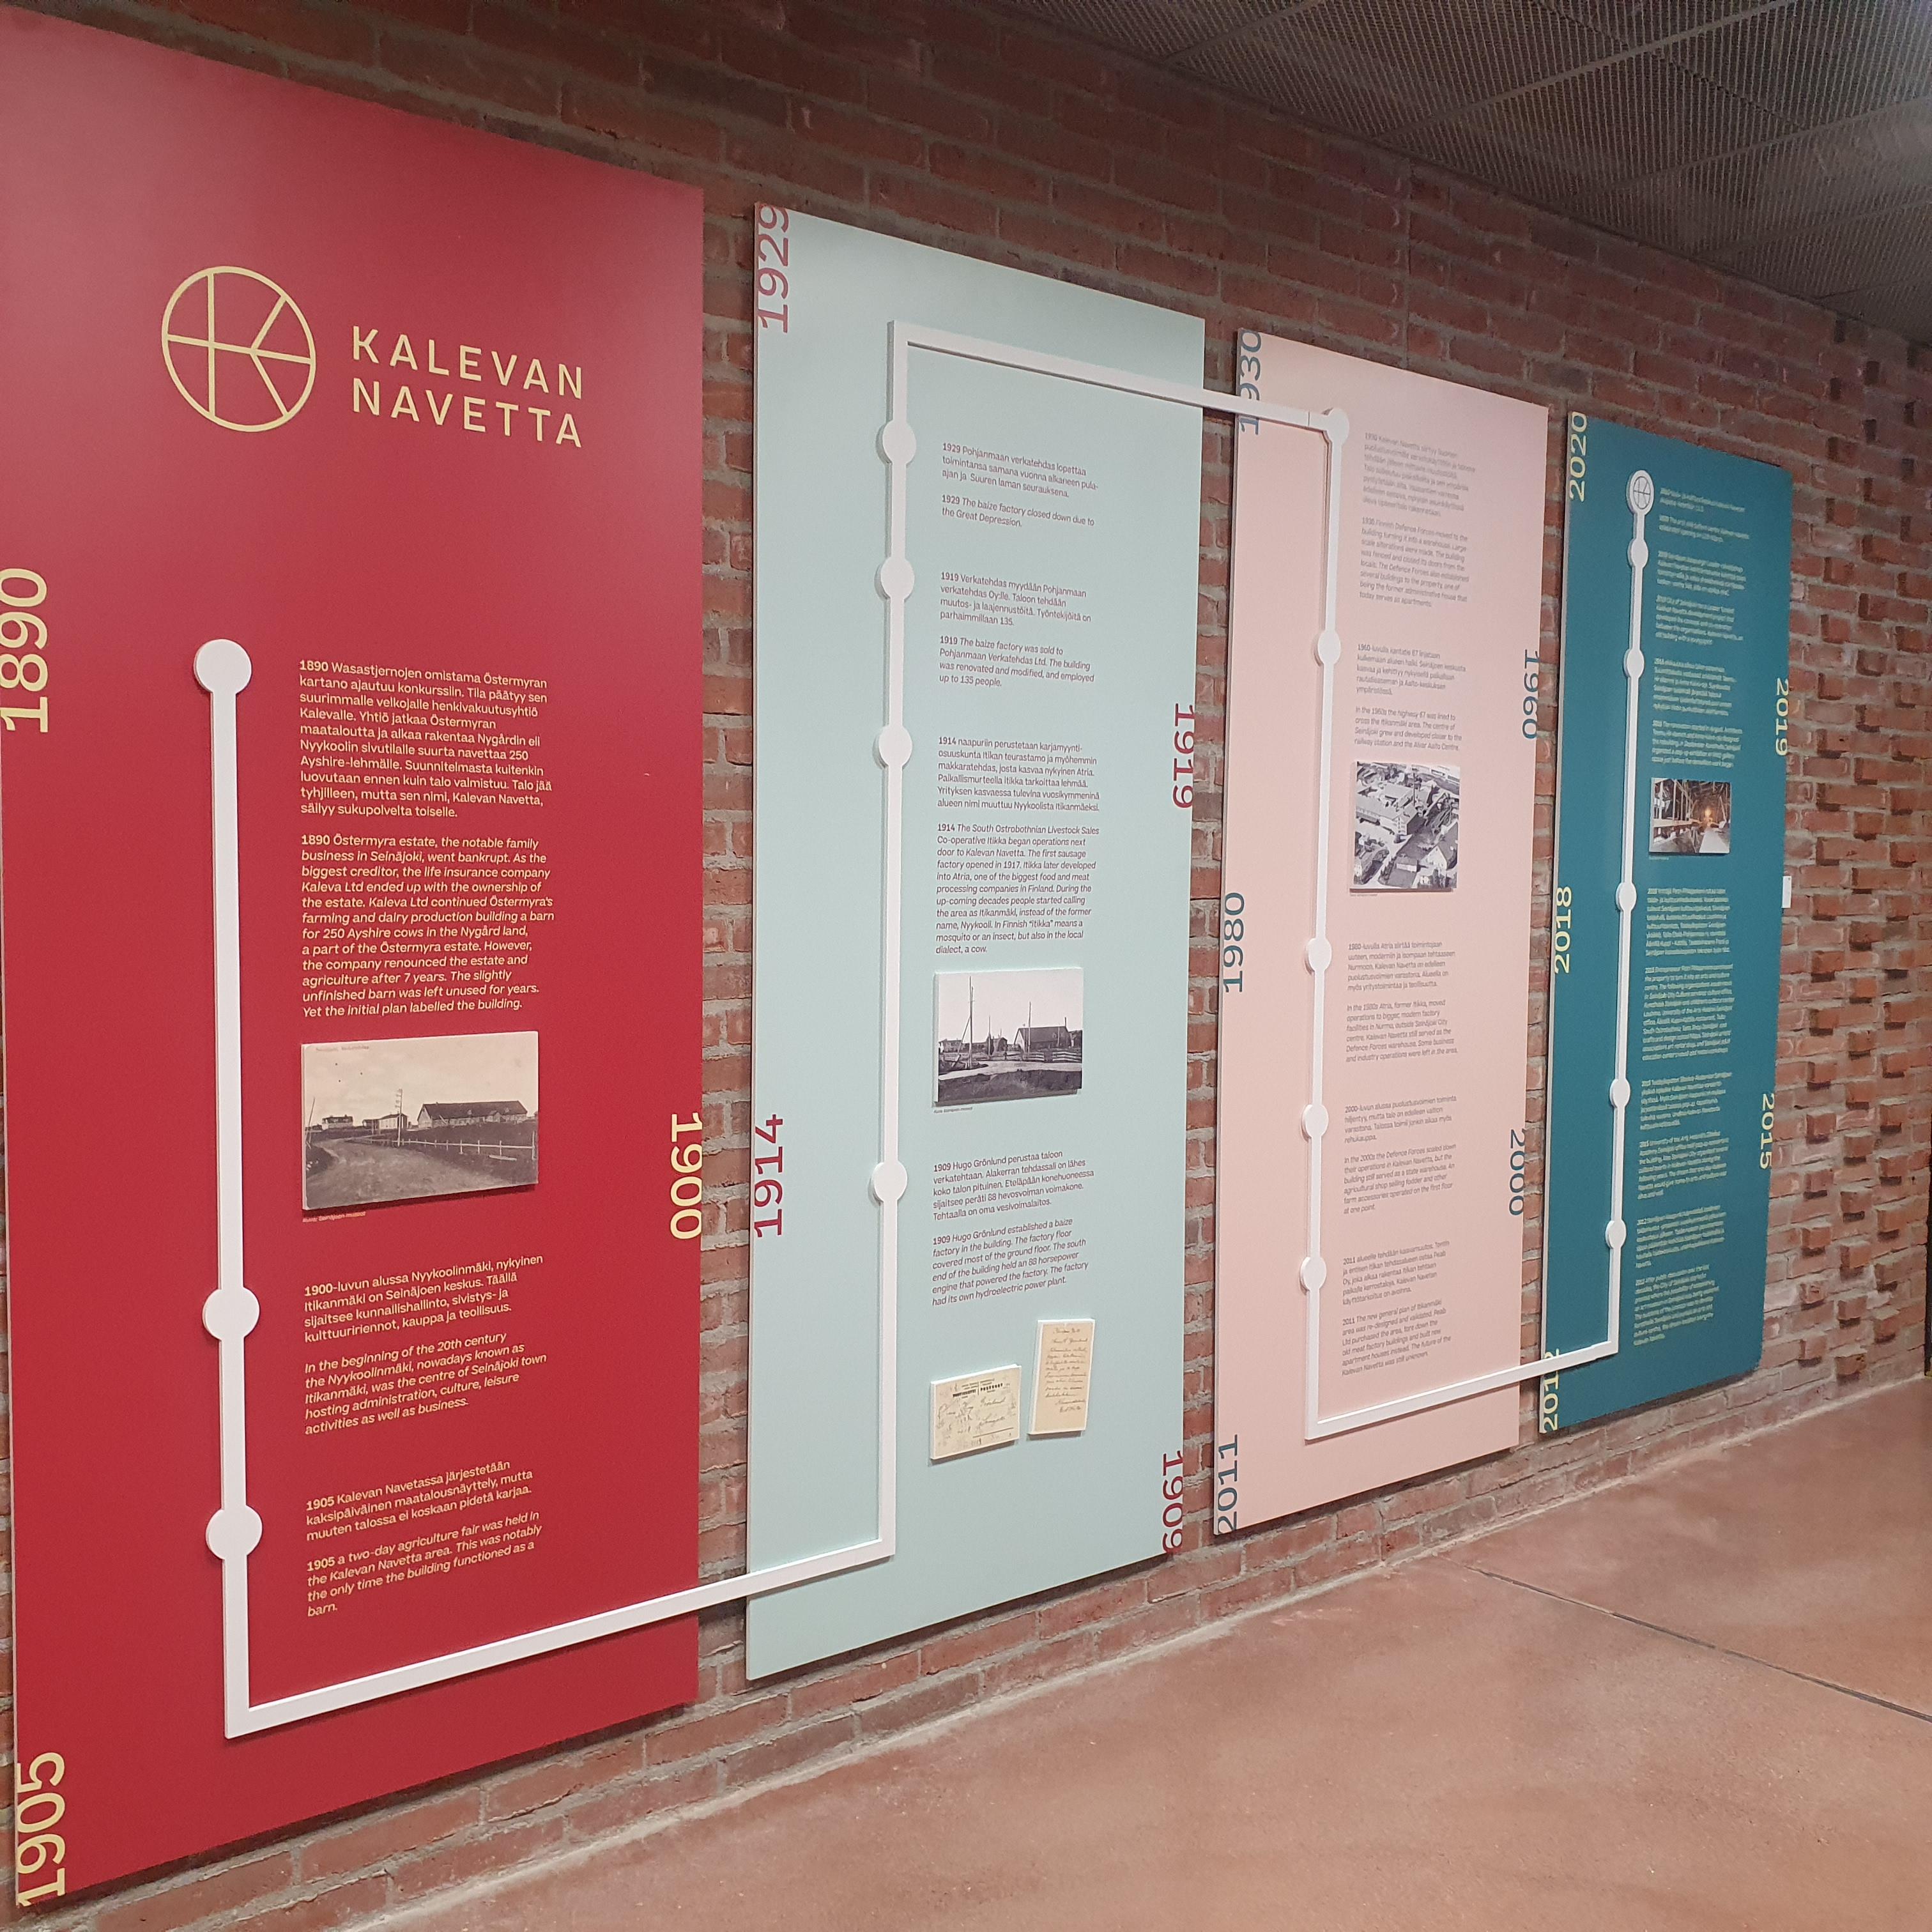 Info boards showing the timeline of Kalevan Navetta